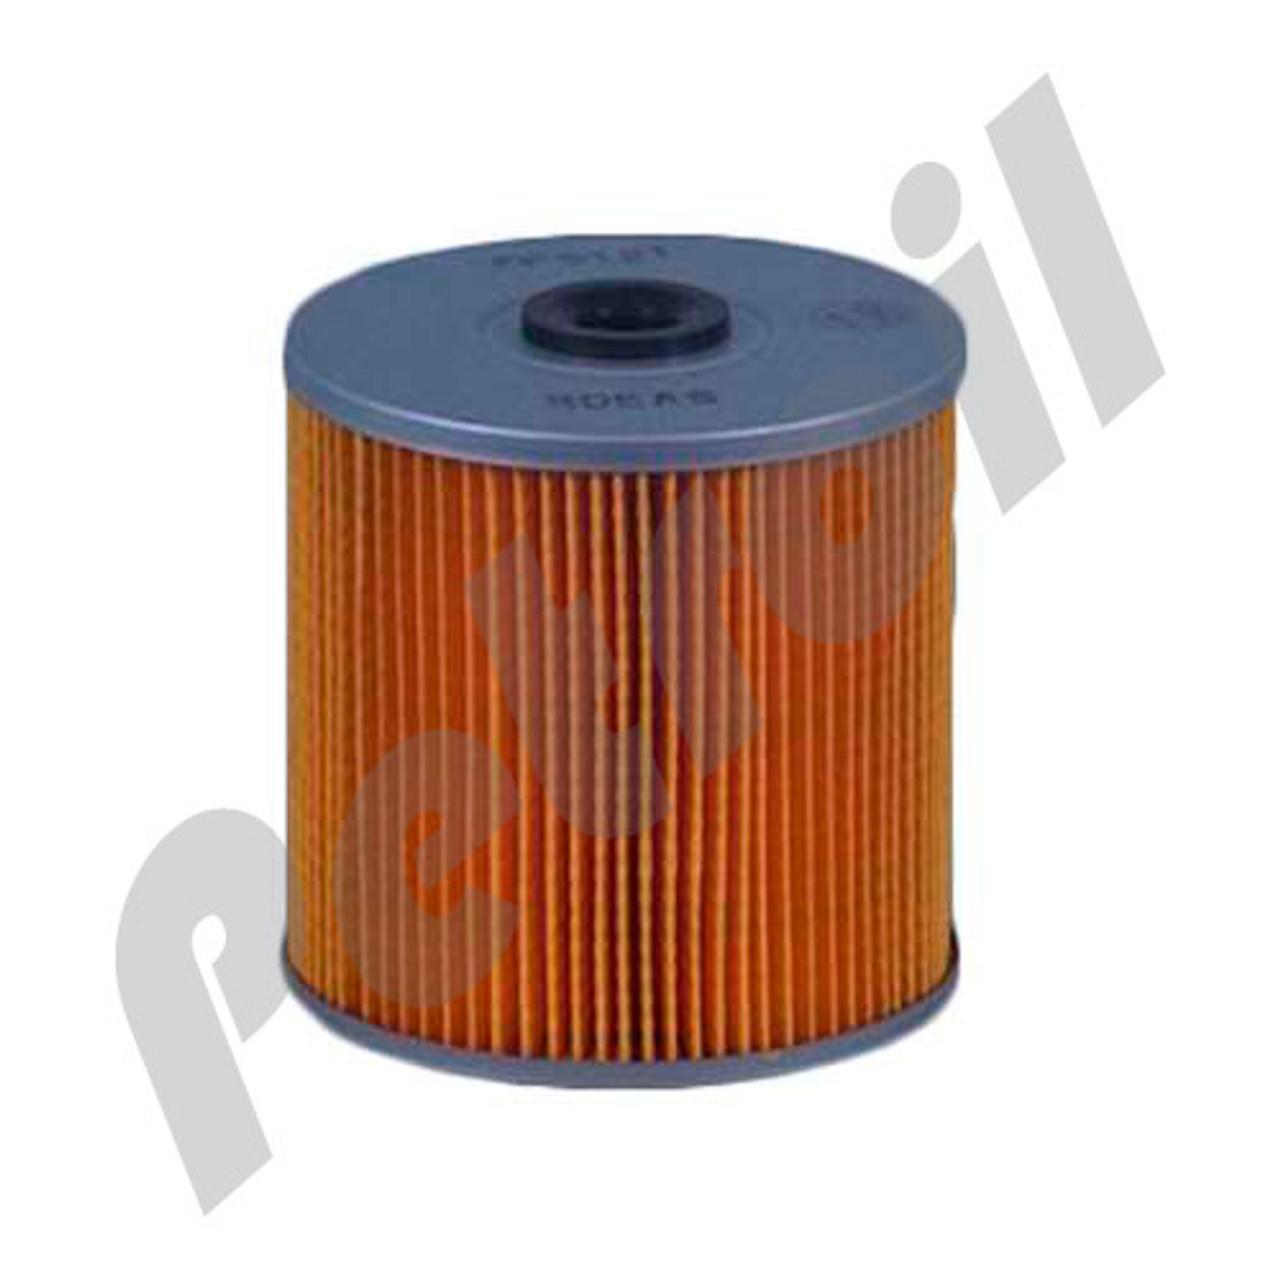 hight resolution of case of 12 ff5121 fleetguard fuel filter cartridge metal hinoshop by brand